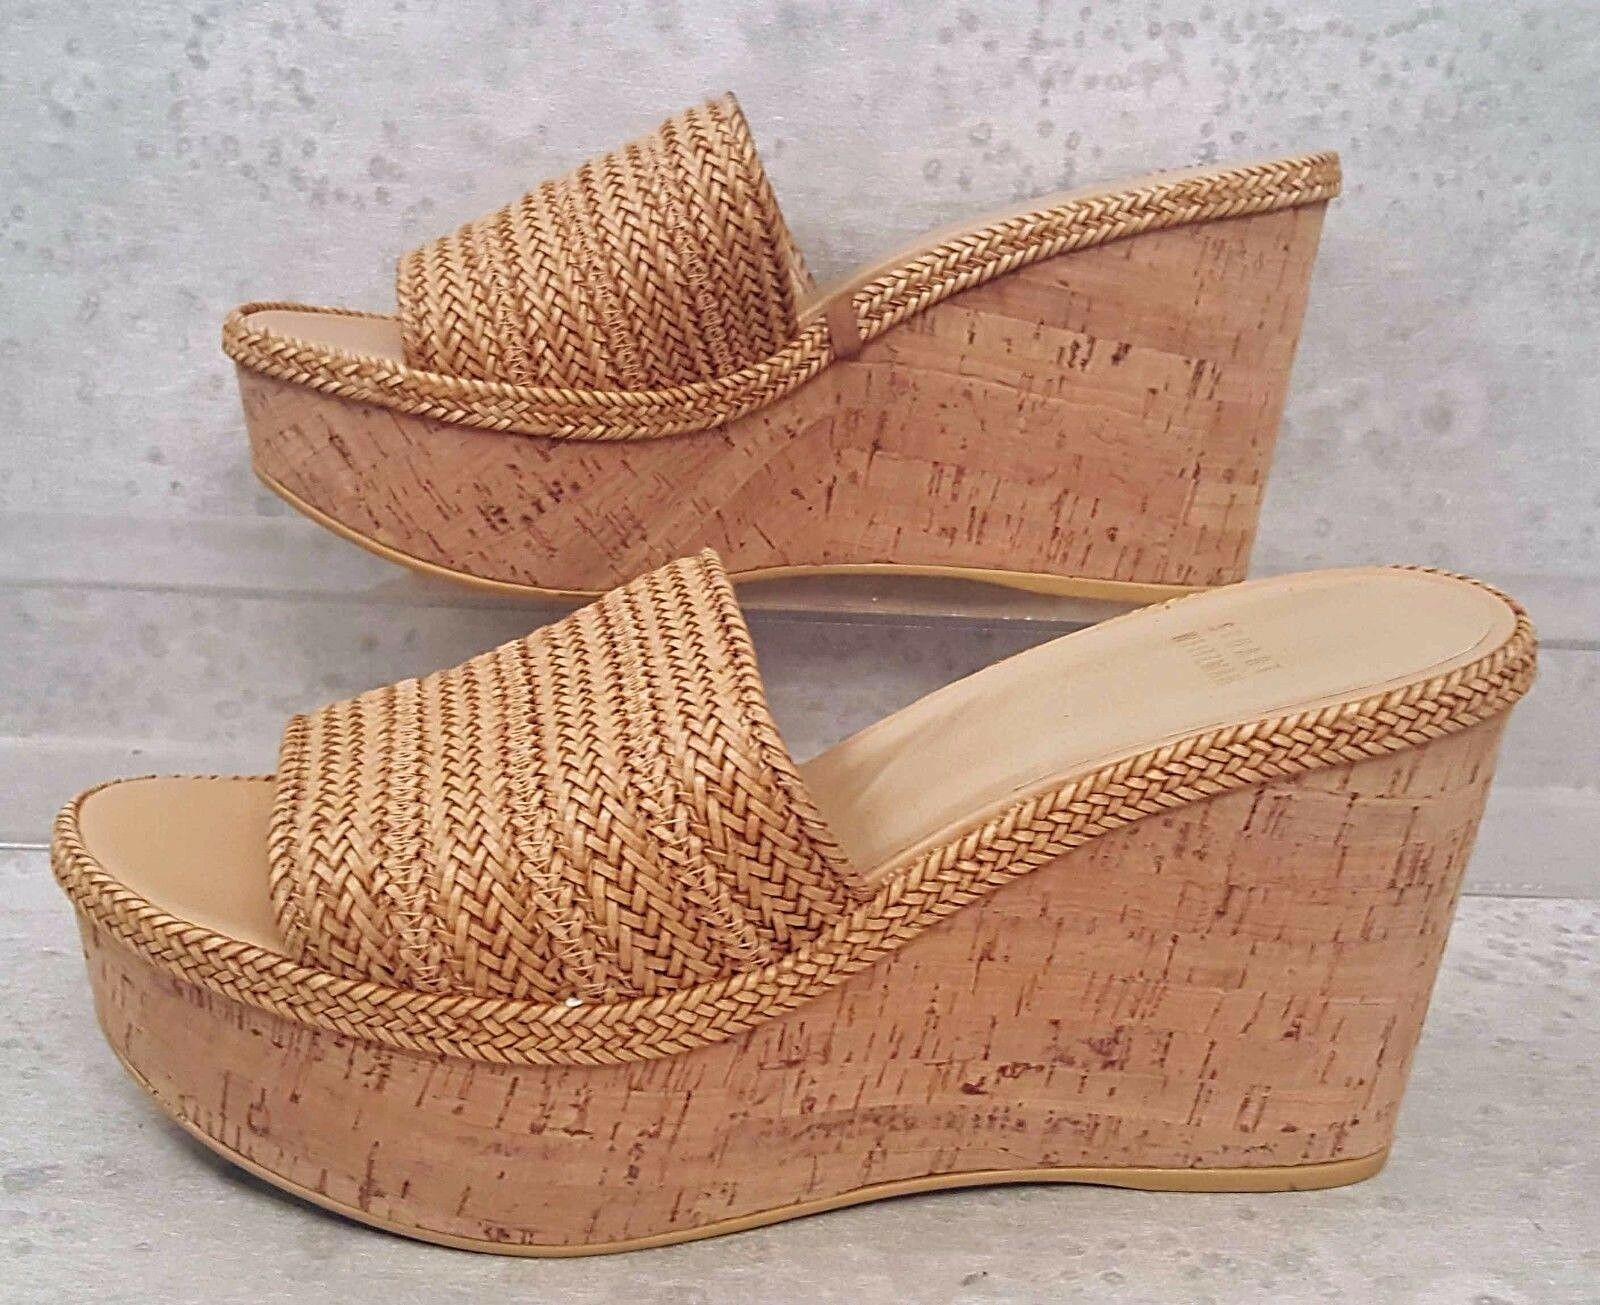 Stuart Weitzman woven wedge sandals cork wedge heel size 8.5 NEW